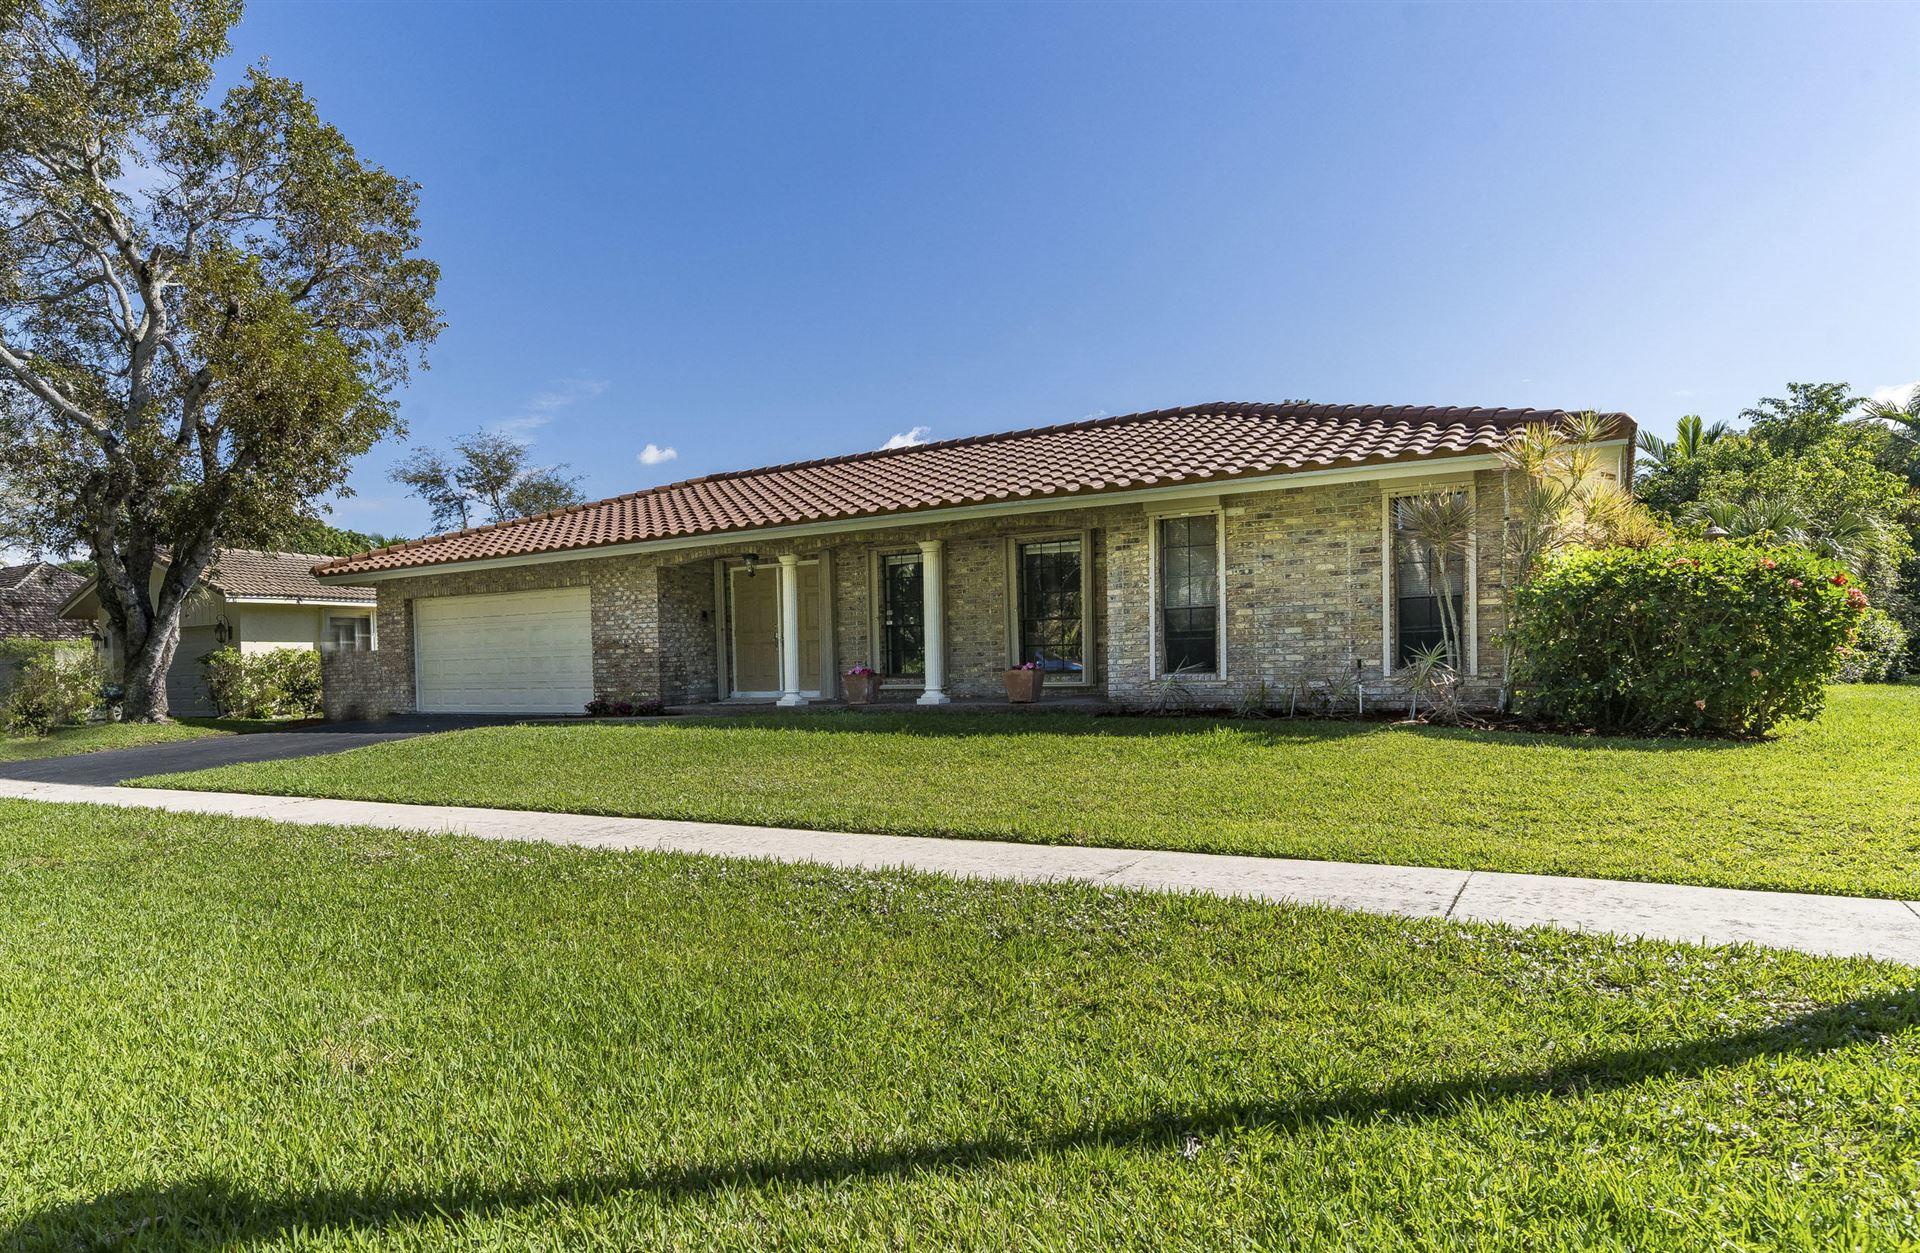 20864 Soneto Drive, Boca Raton, FL 33433 - #: RX-10633908